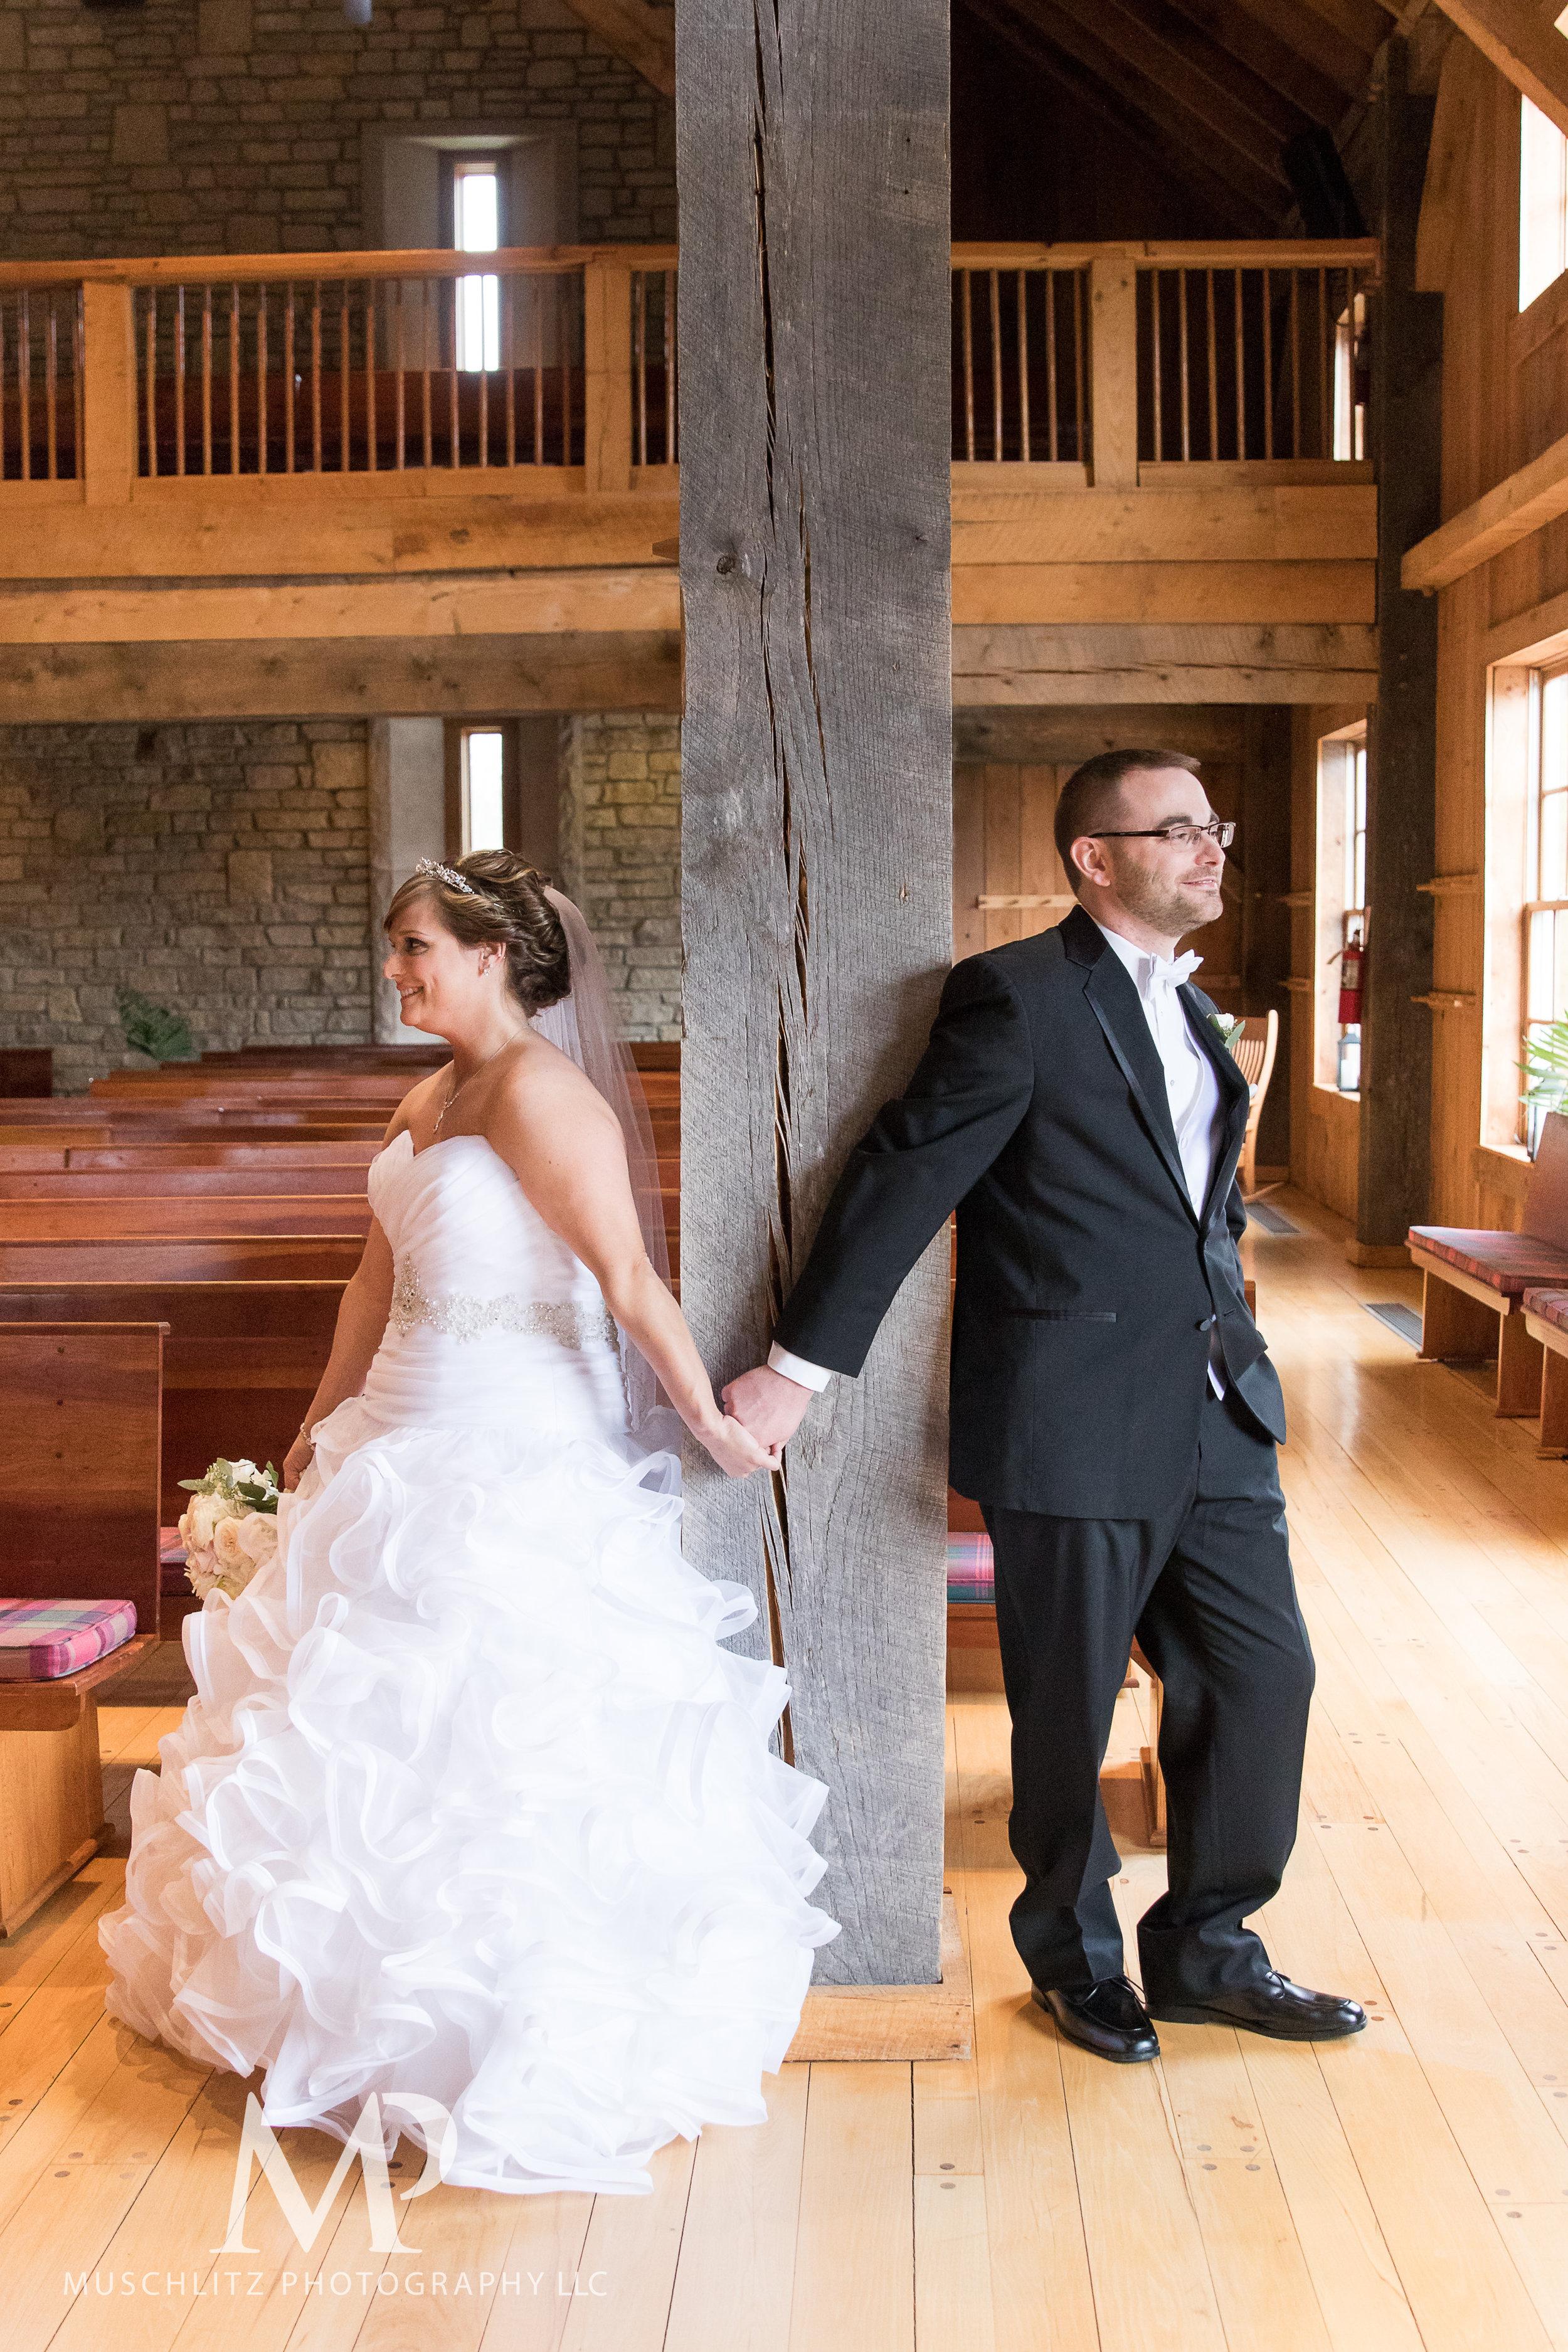 liberty-barn-presbyterian-church-wedding-delaware-columbus-ohio-muschlitz-photography-019.JPG